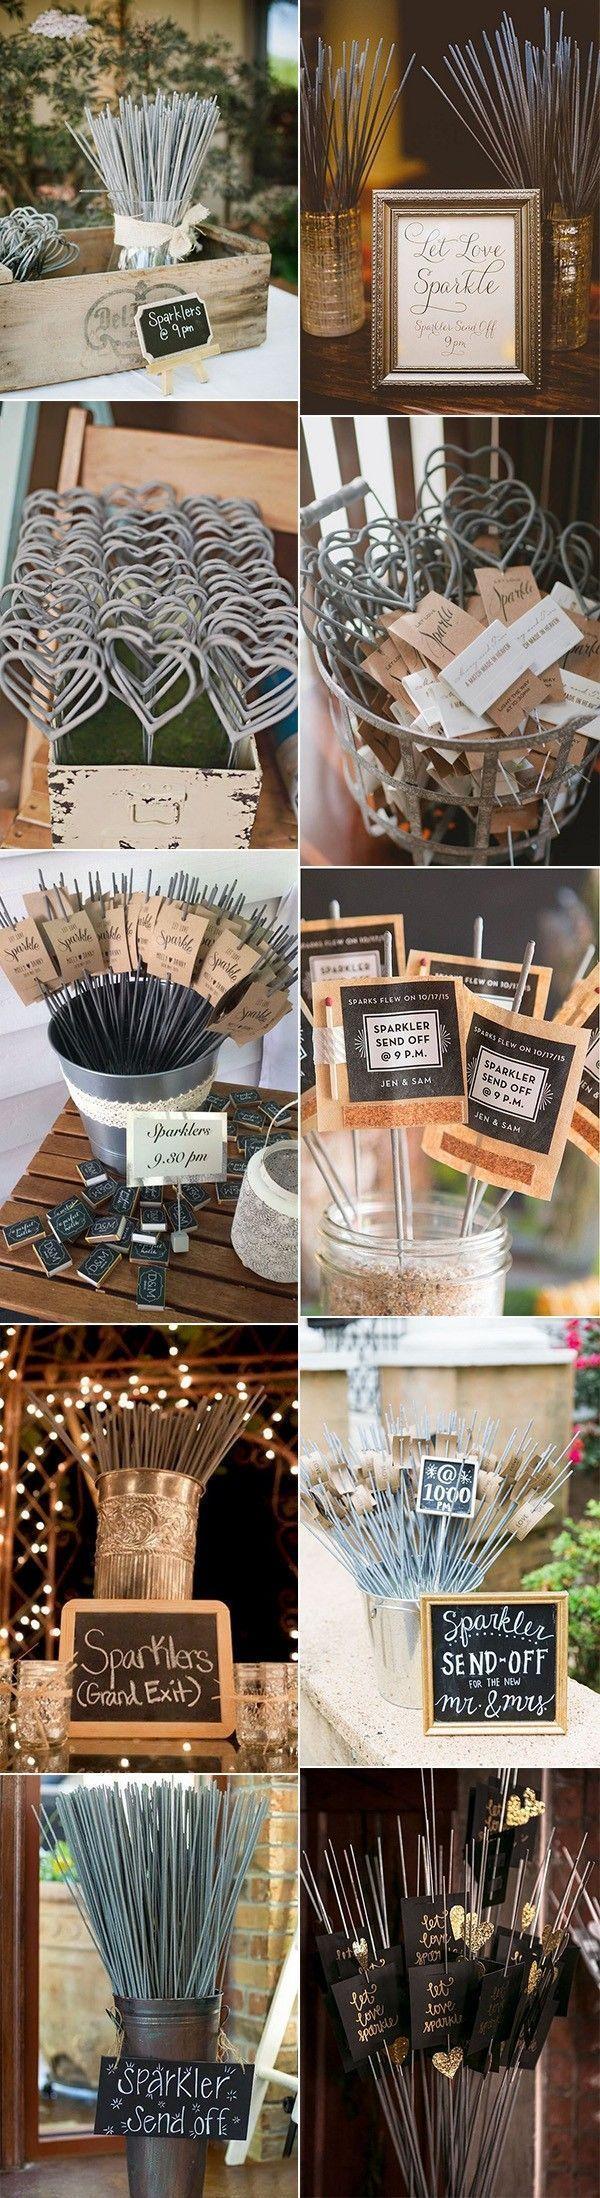 sparklers send off wedding ideas for 2018 #weddingideas #weddingphotos #weddingexits #weddingsparklers #tipsfordecoration